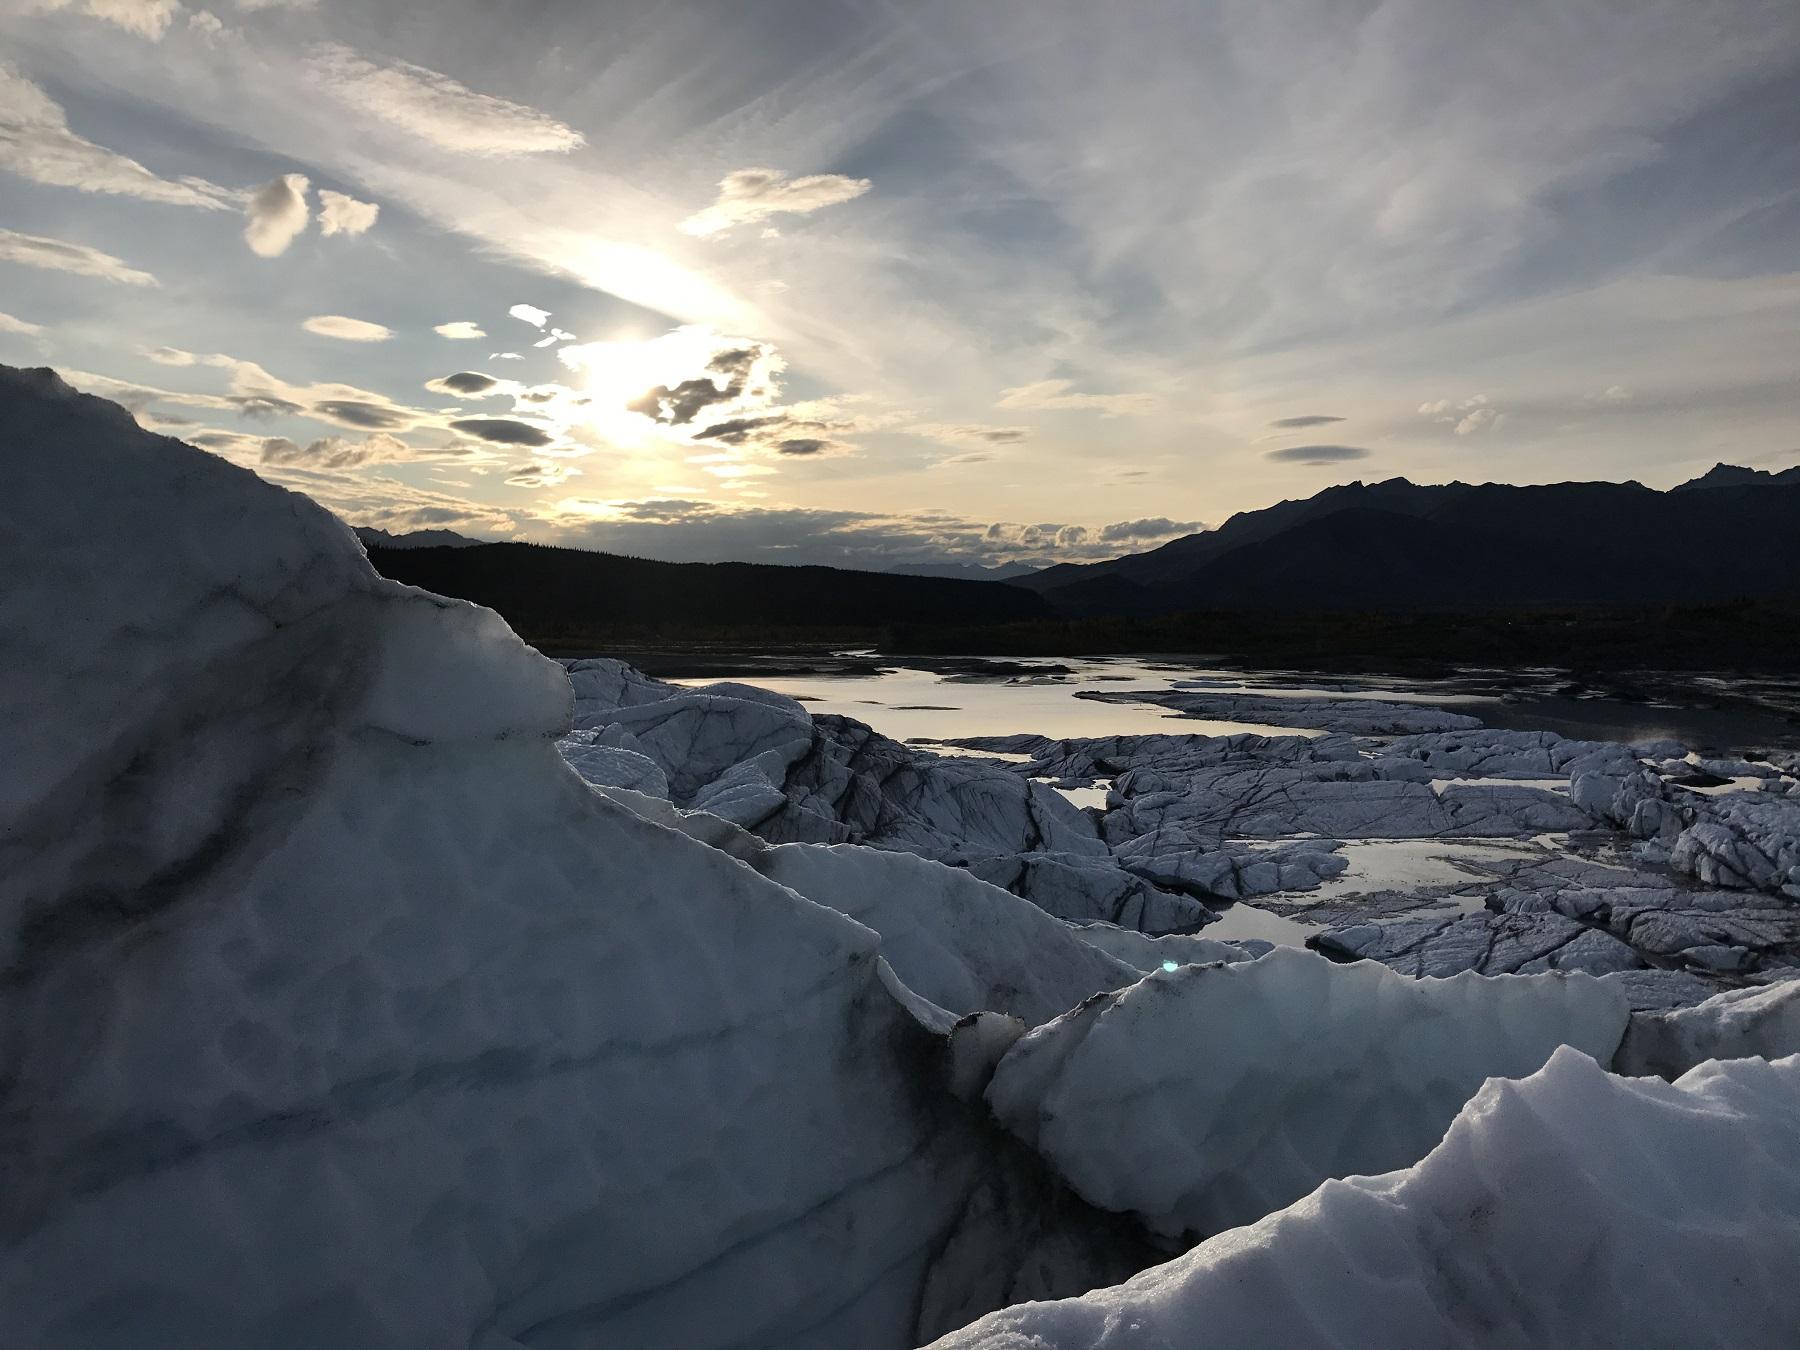 Sleeping on a Glacier